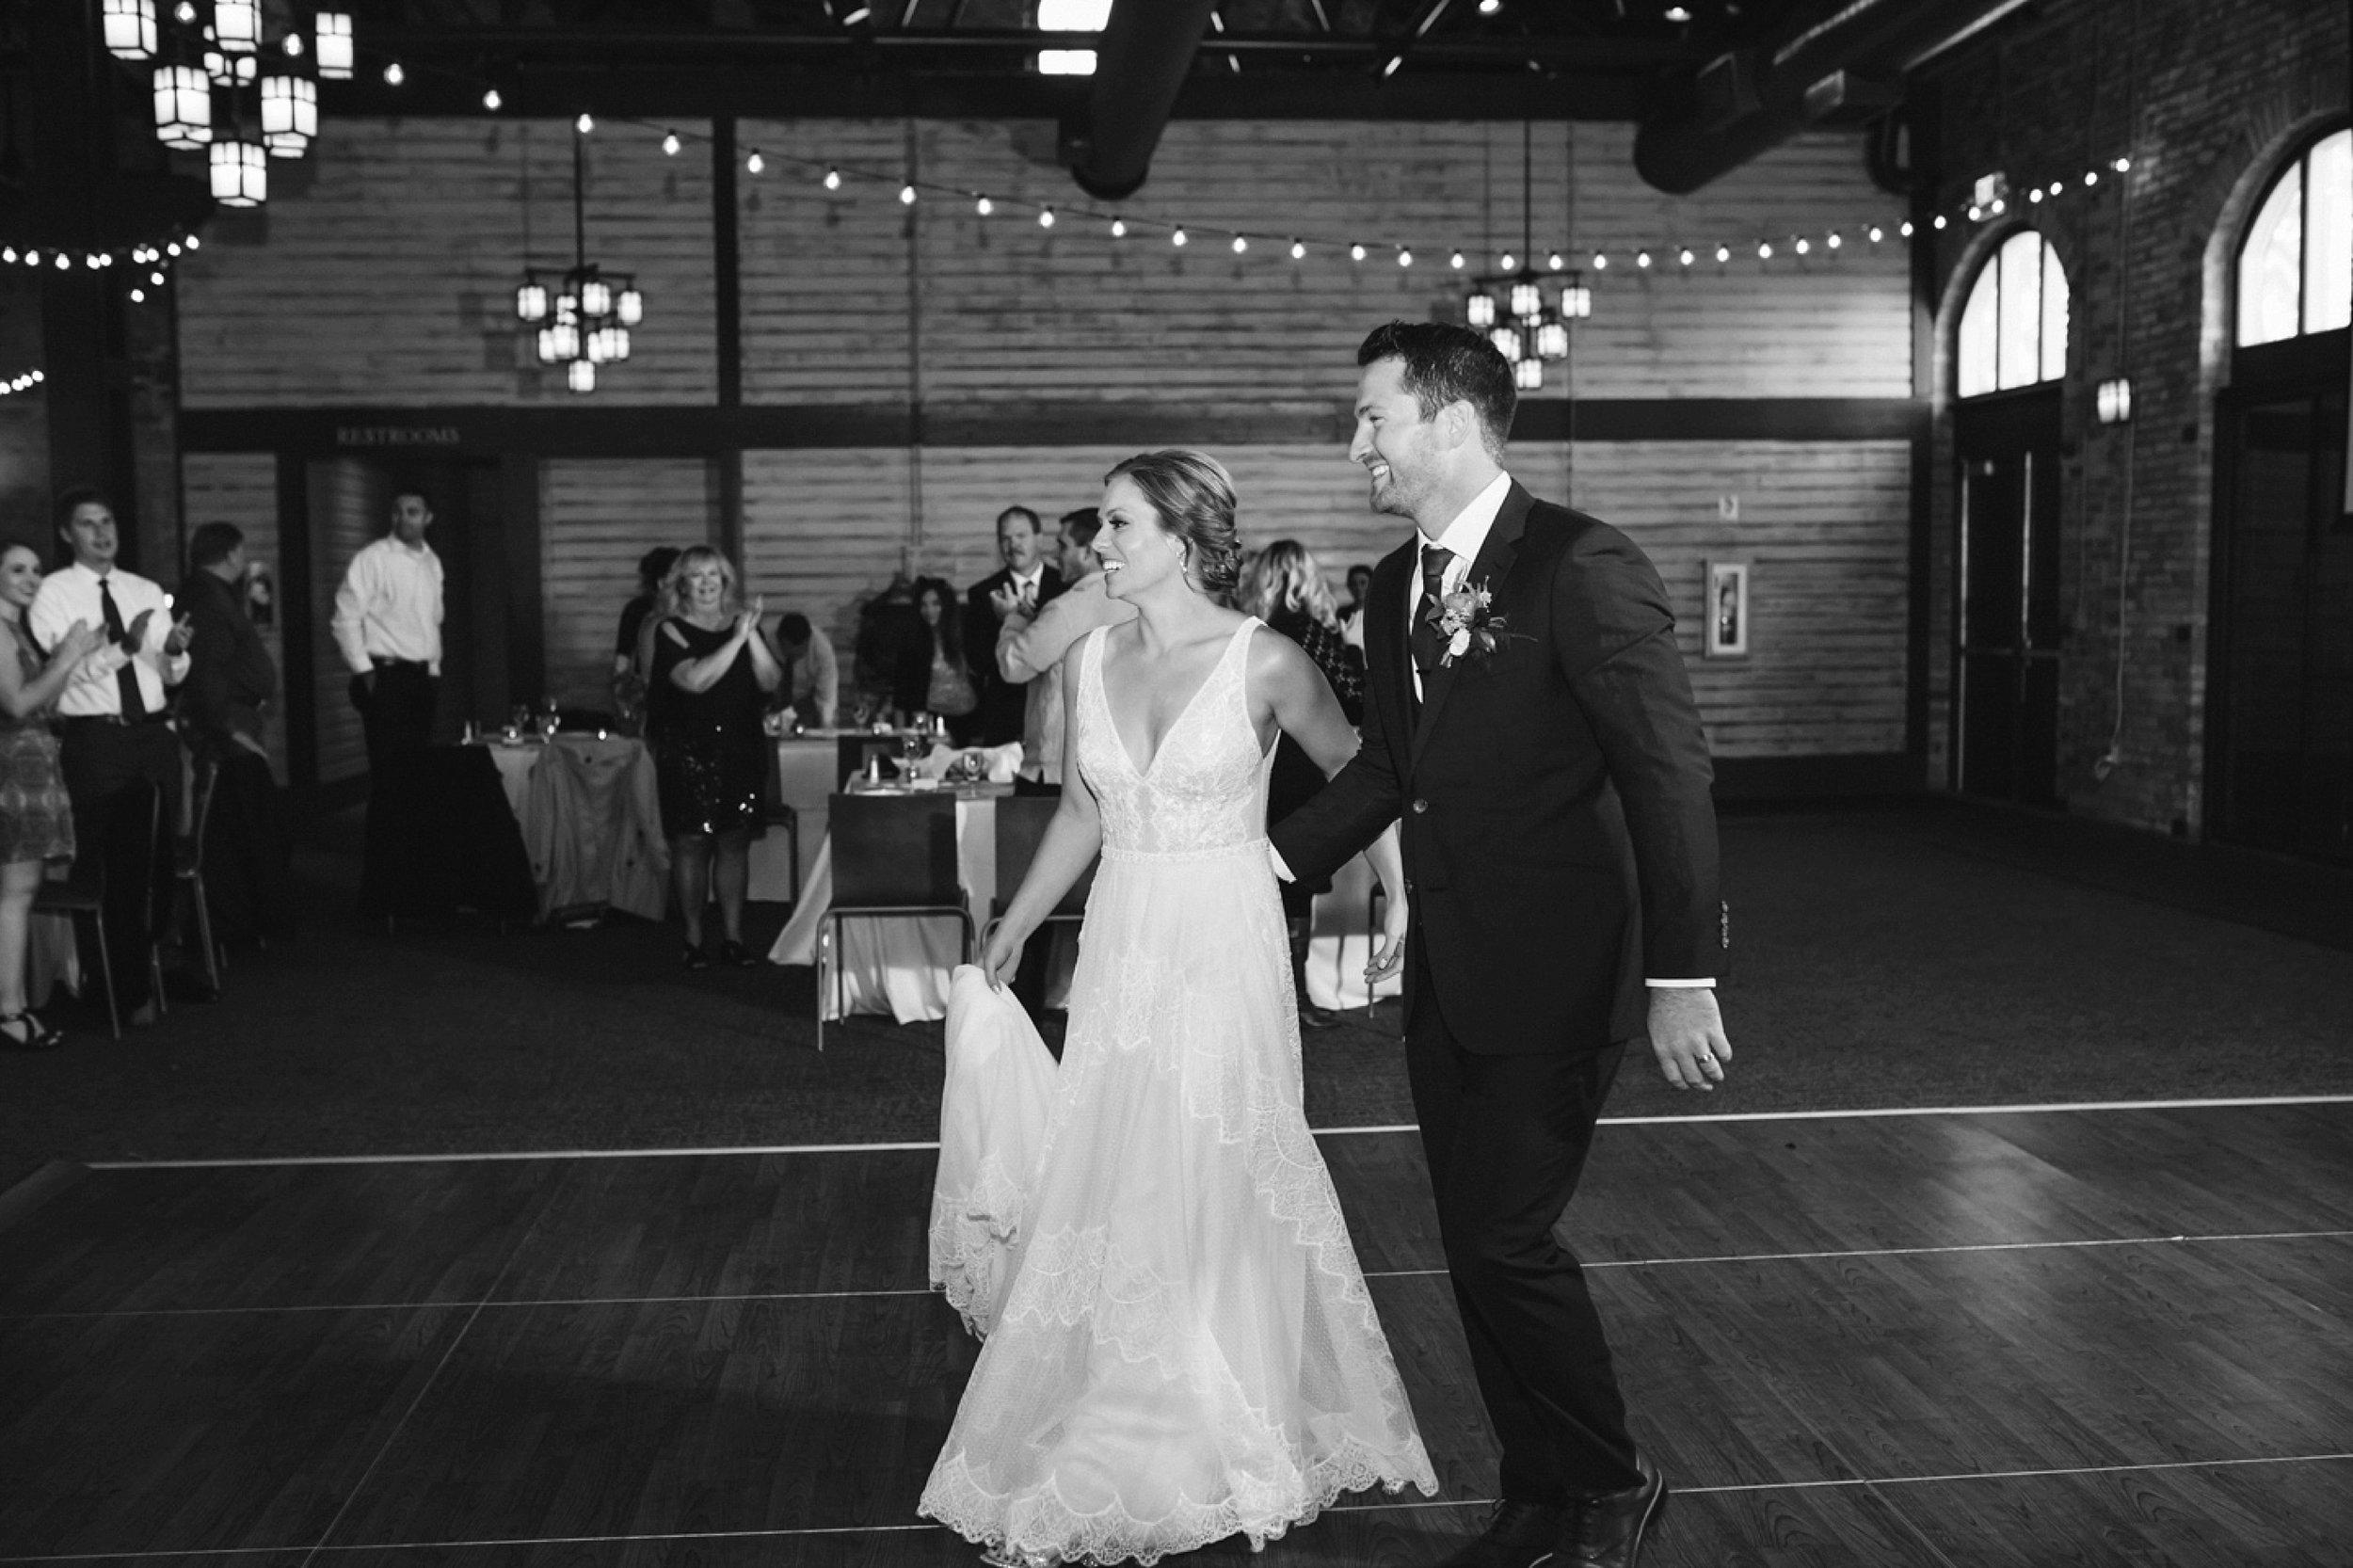 Nicollet-Island-Pavilion-Minneapolis-September-Coral-Navy-Wedding-137.jpg